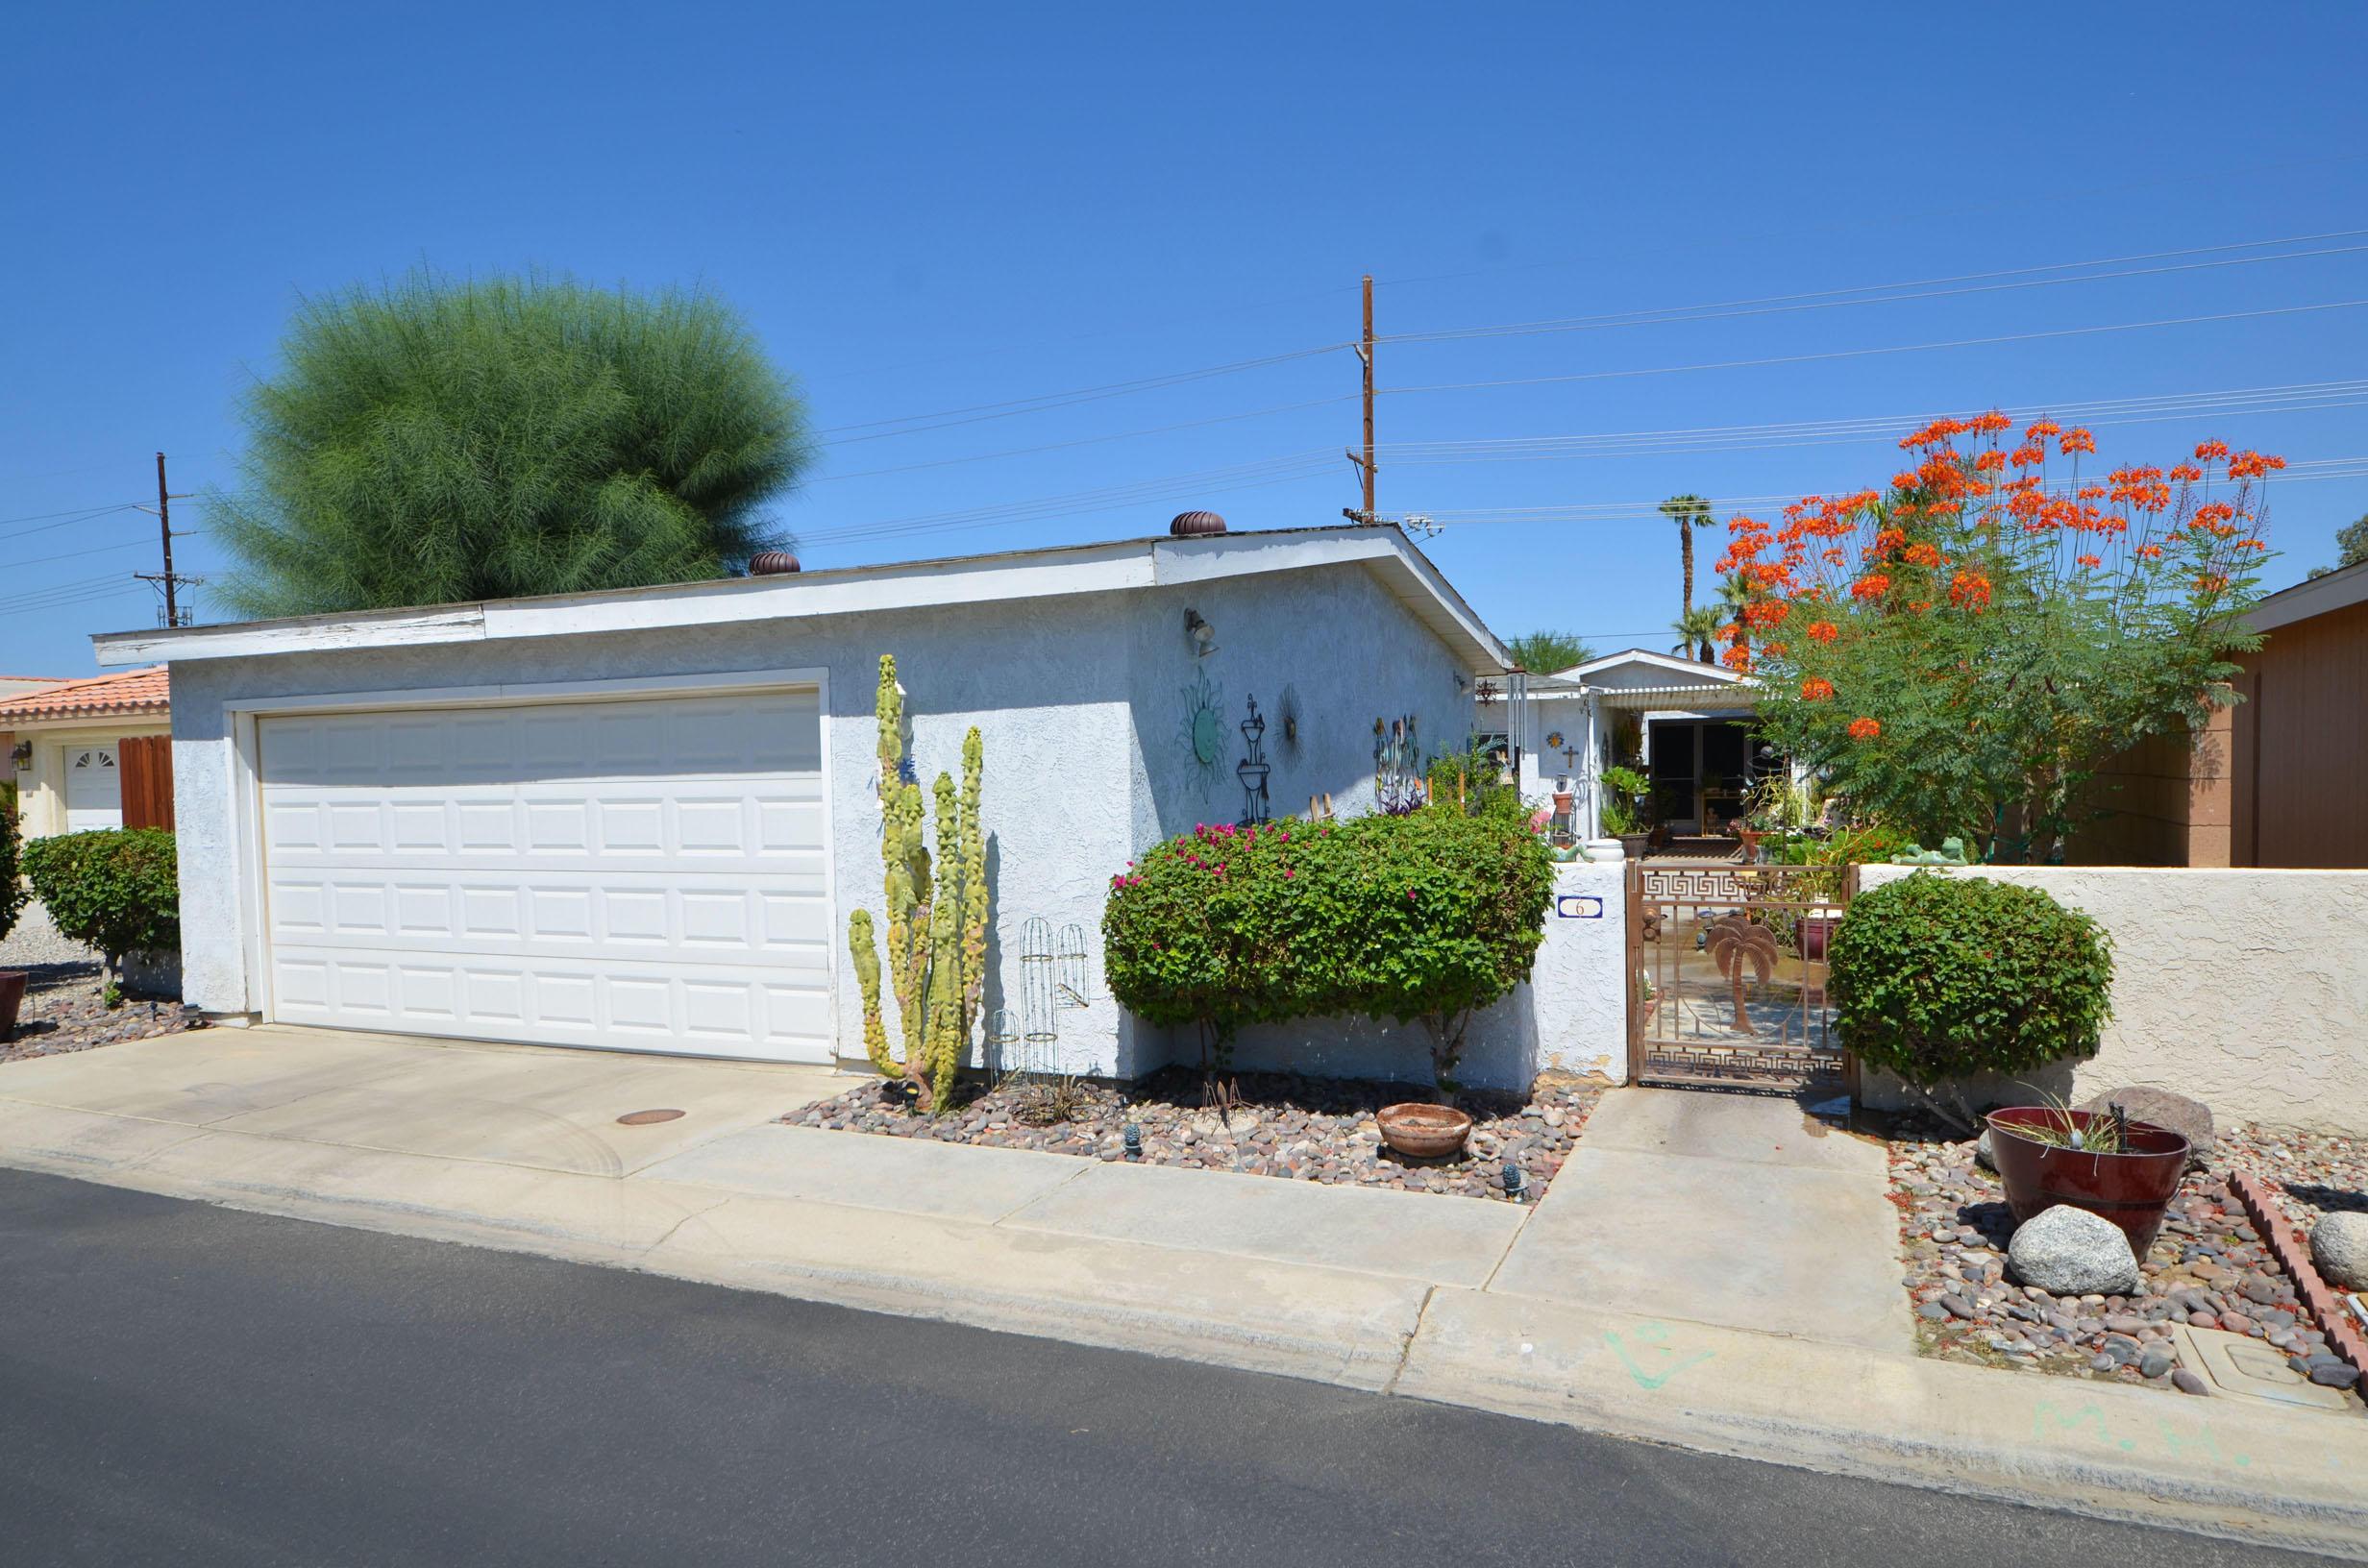 Photo of 81641 Ave 48 #6, Indio, CA 92201